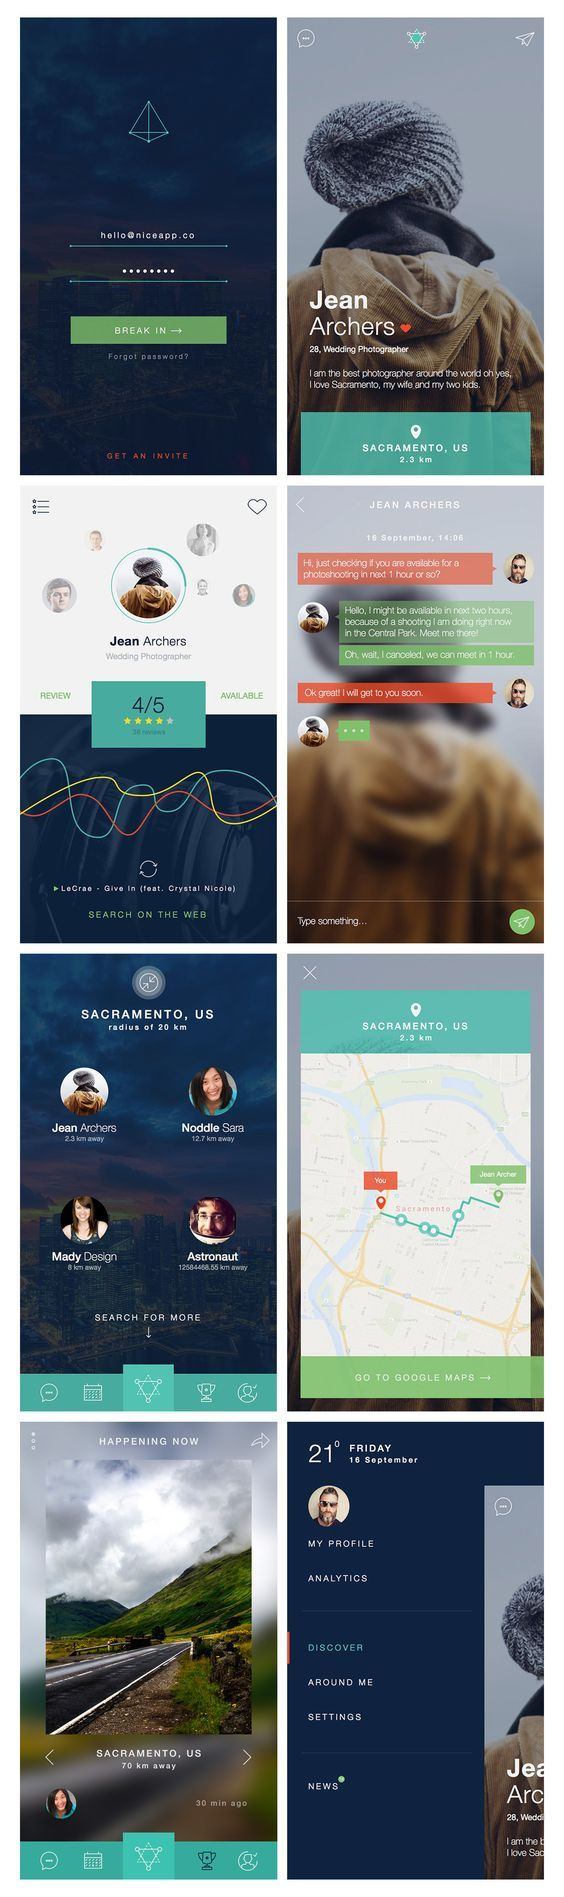 Nerdial App UI – 8 screens FREE PSD on Behance: